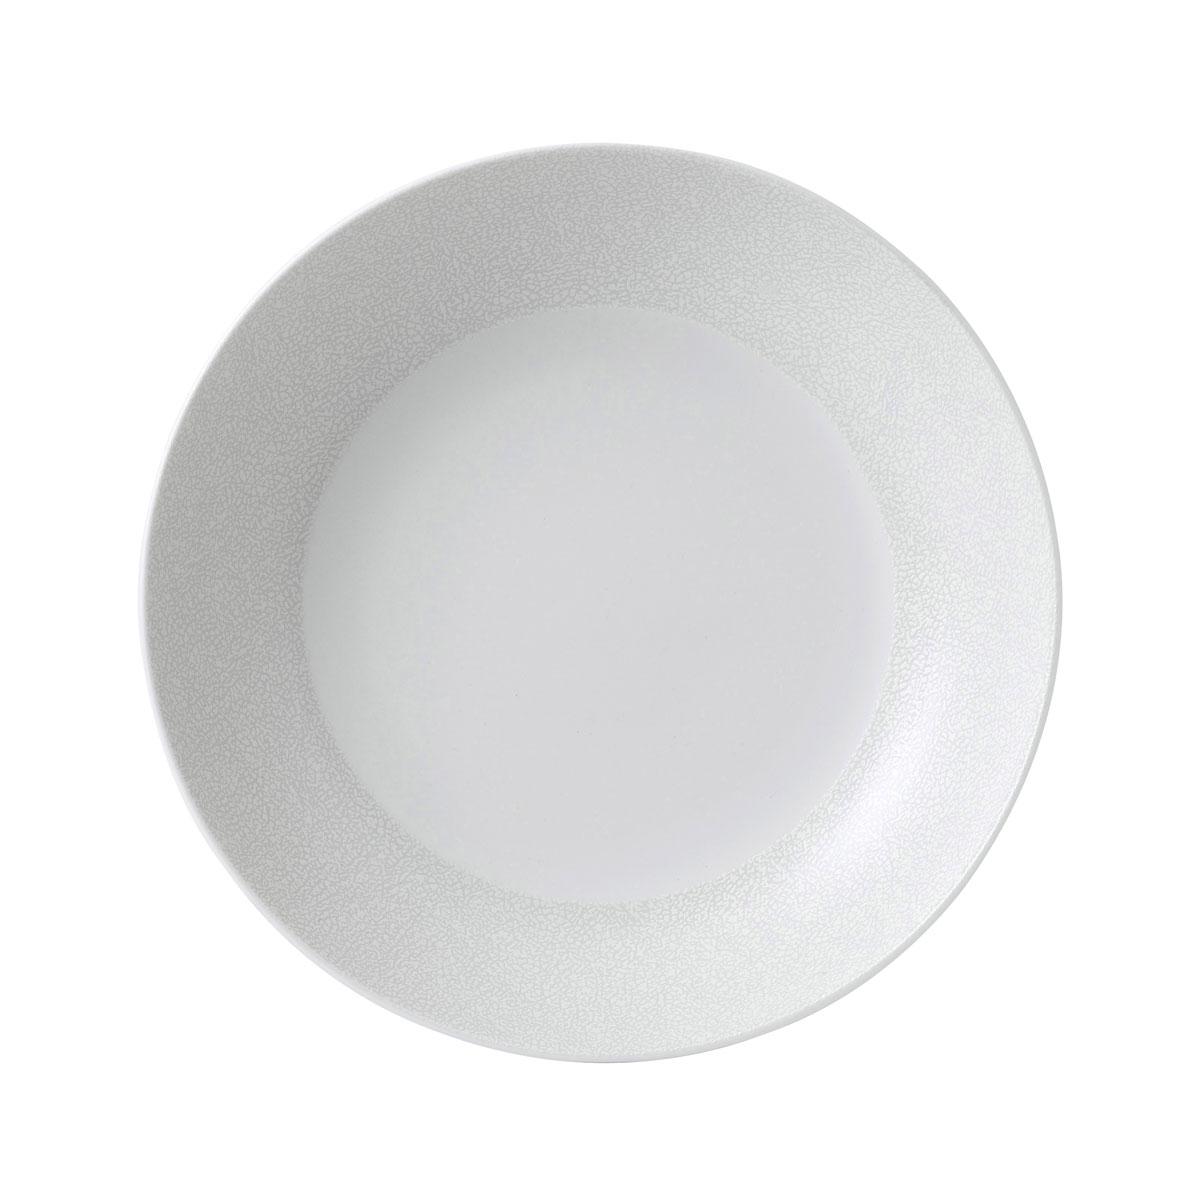 "Wedgwood Gio Pearl Pasta Bowl 9.6"""